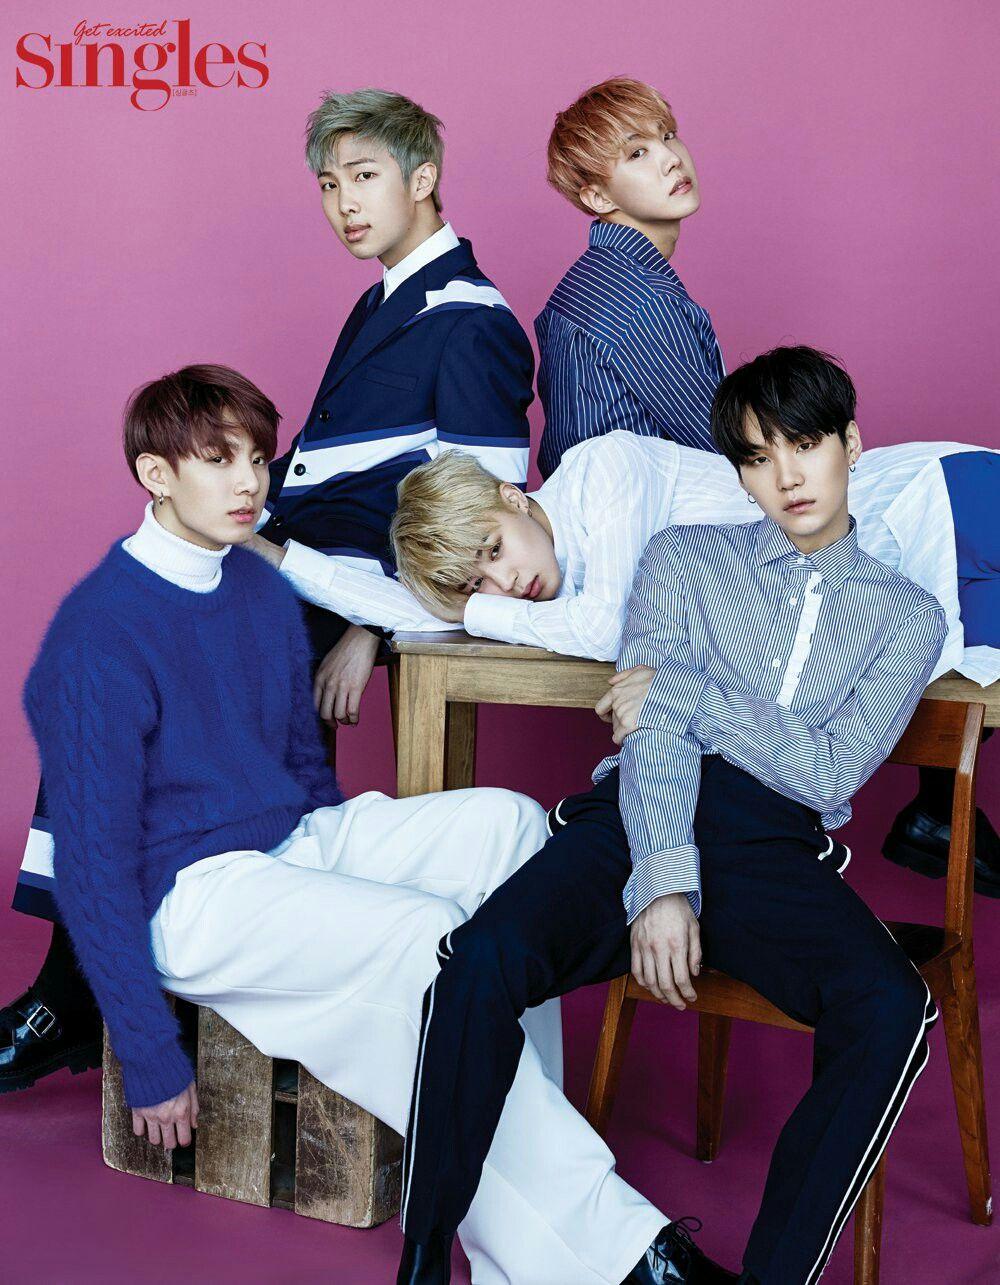 BTS for Singles Magazine January 2017 Issue ❤ #BTS #방탄소년단